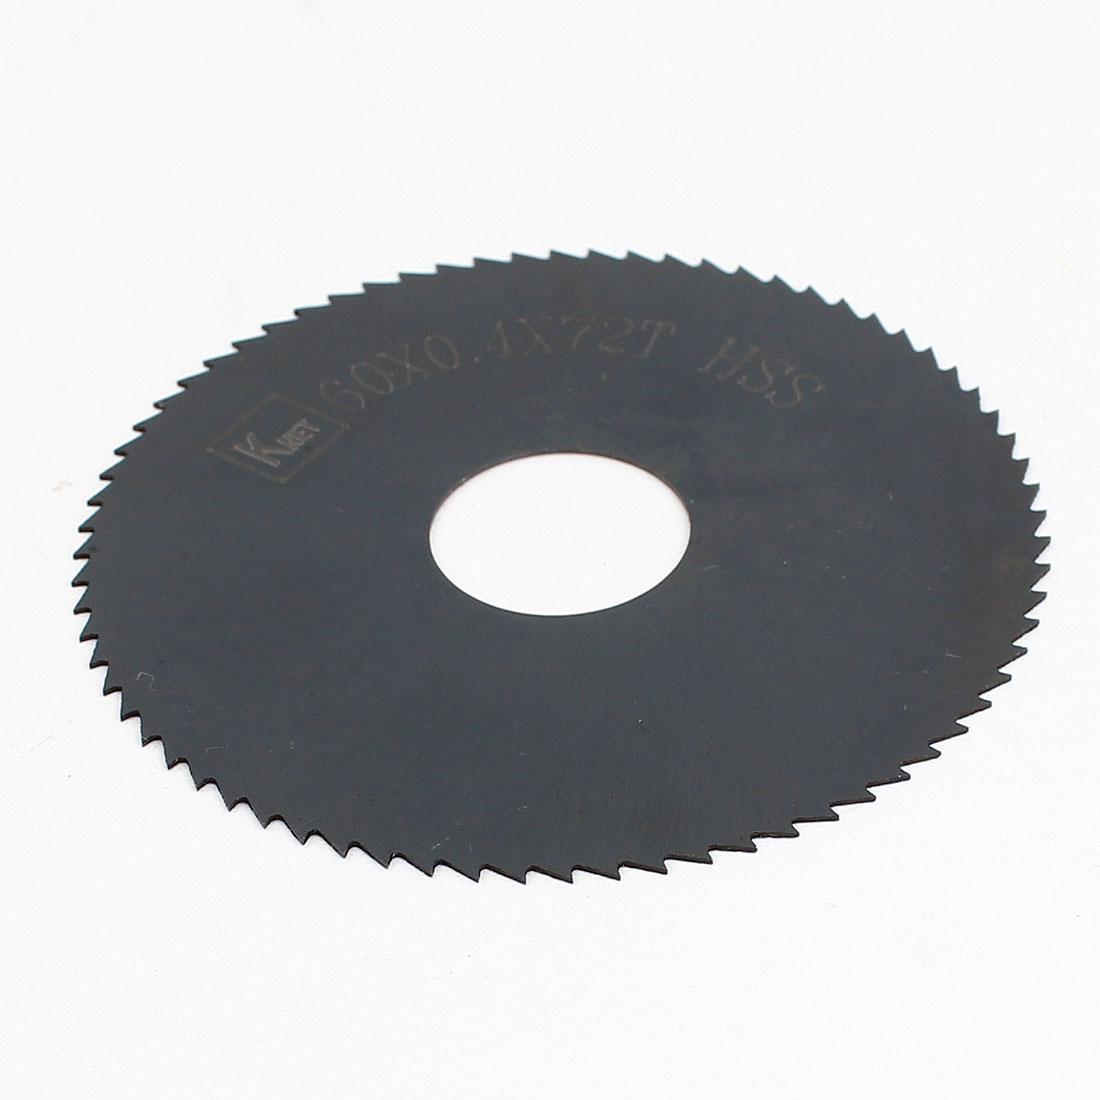 HSS 72 Teeth 60mm x 0.4mm x 16mm Slitting Saw Black